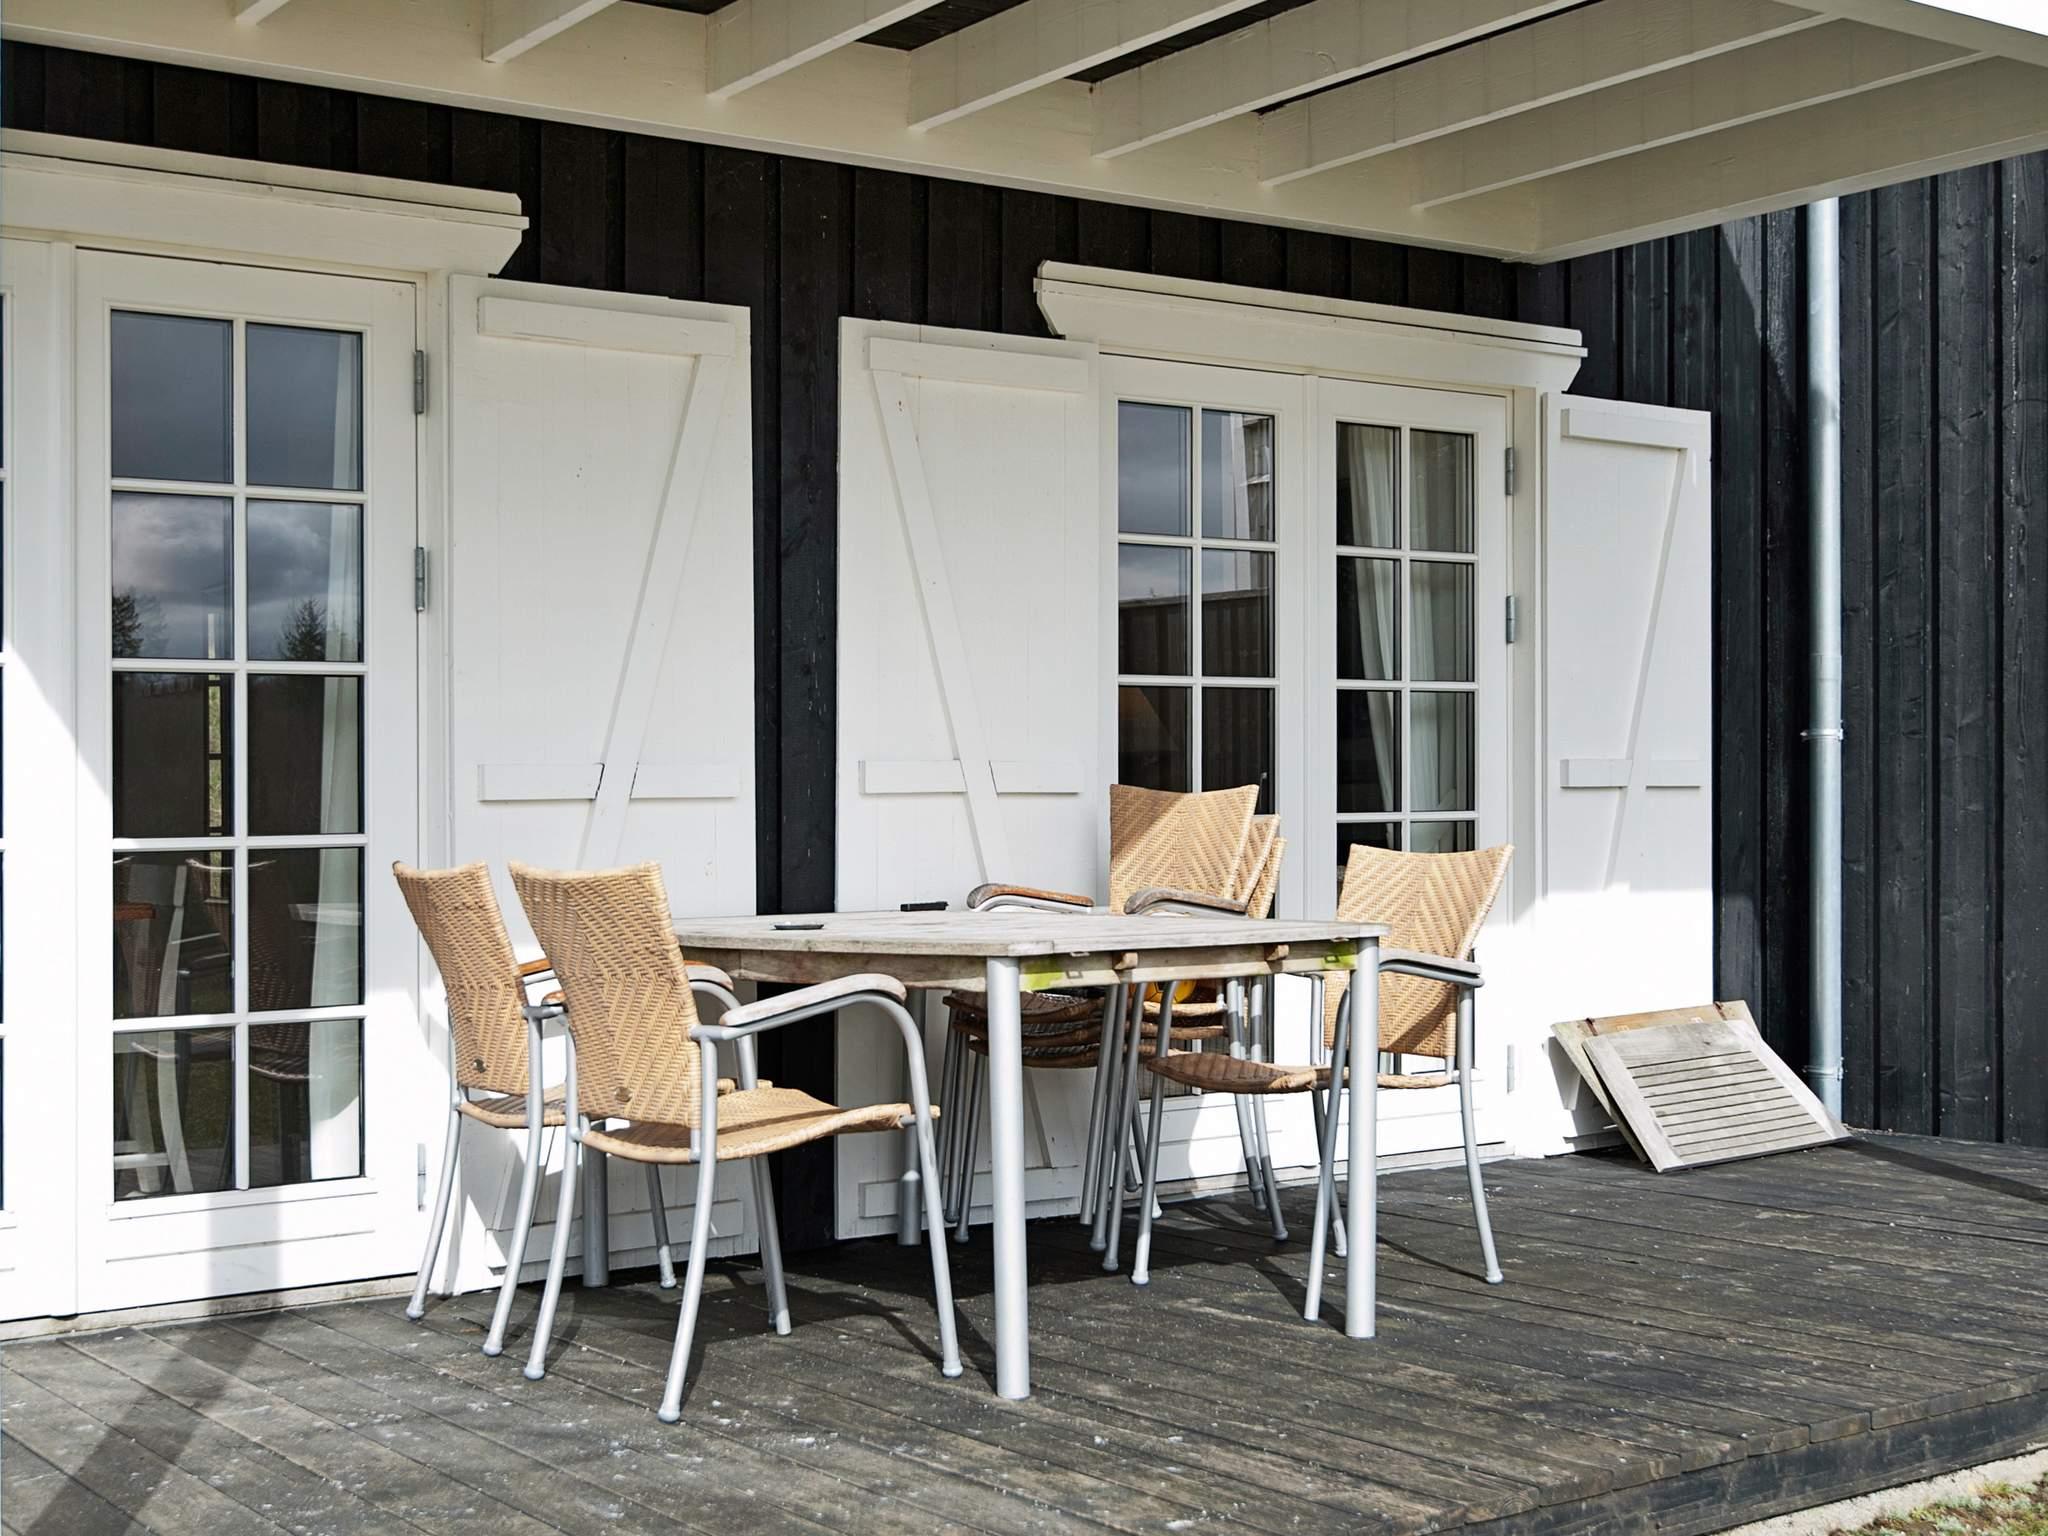 Ferienhaus Søhøjlandet/Gjern (1085178), Gjern, , Ostjütland, Dänemark, Bild 23